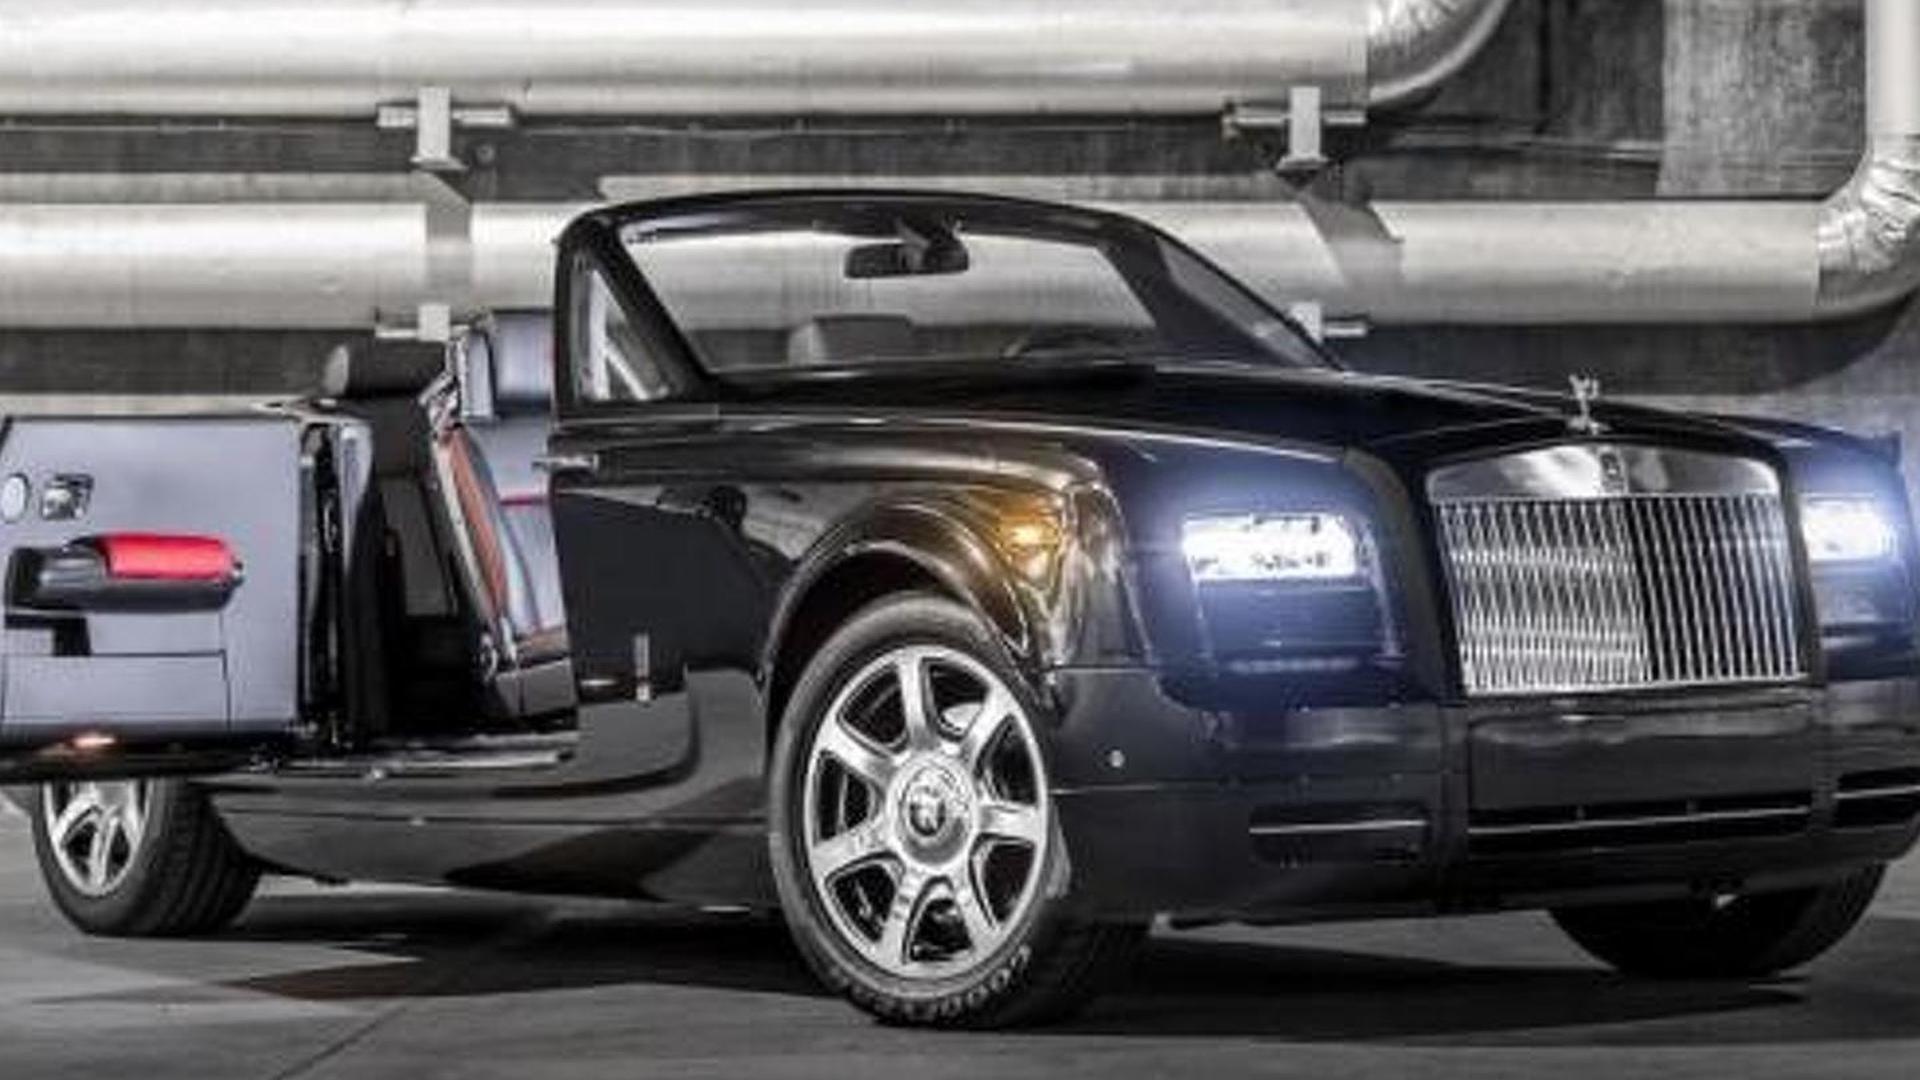 Rolls-Royce introduces Phantom Drophead Coupe Nighthawk in North America